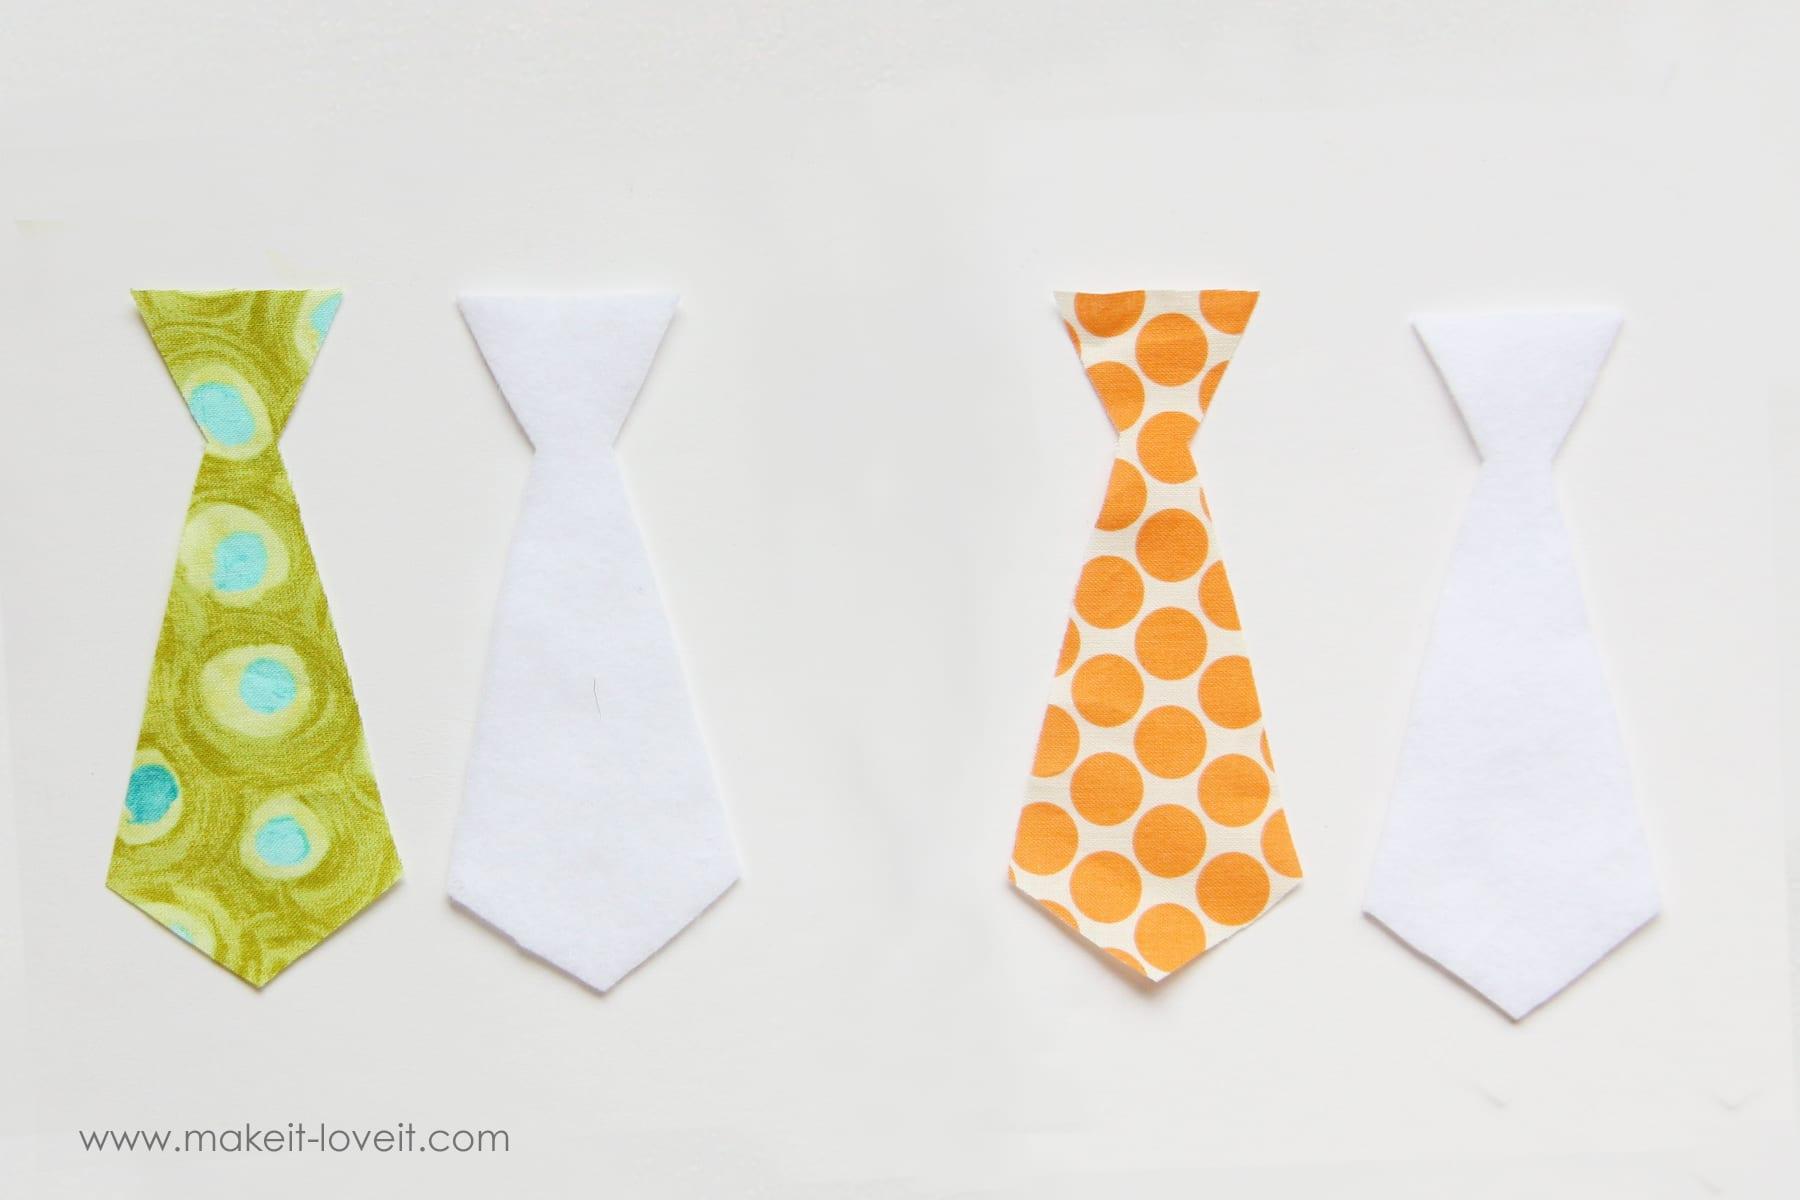 fabric tie